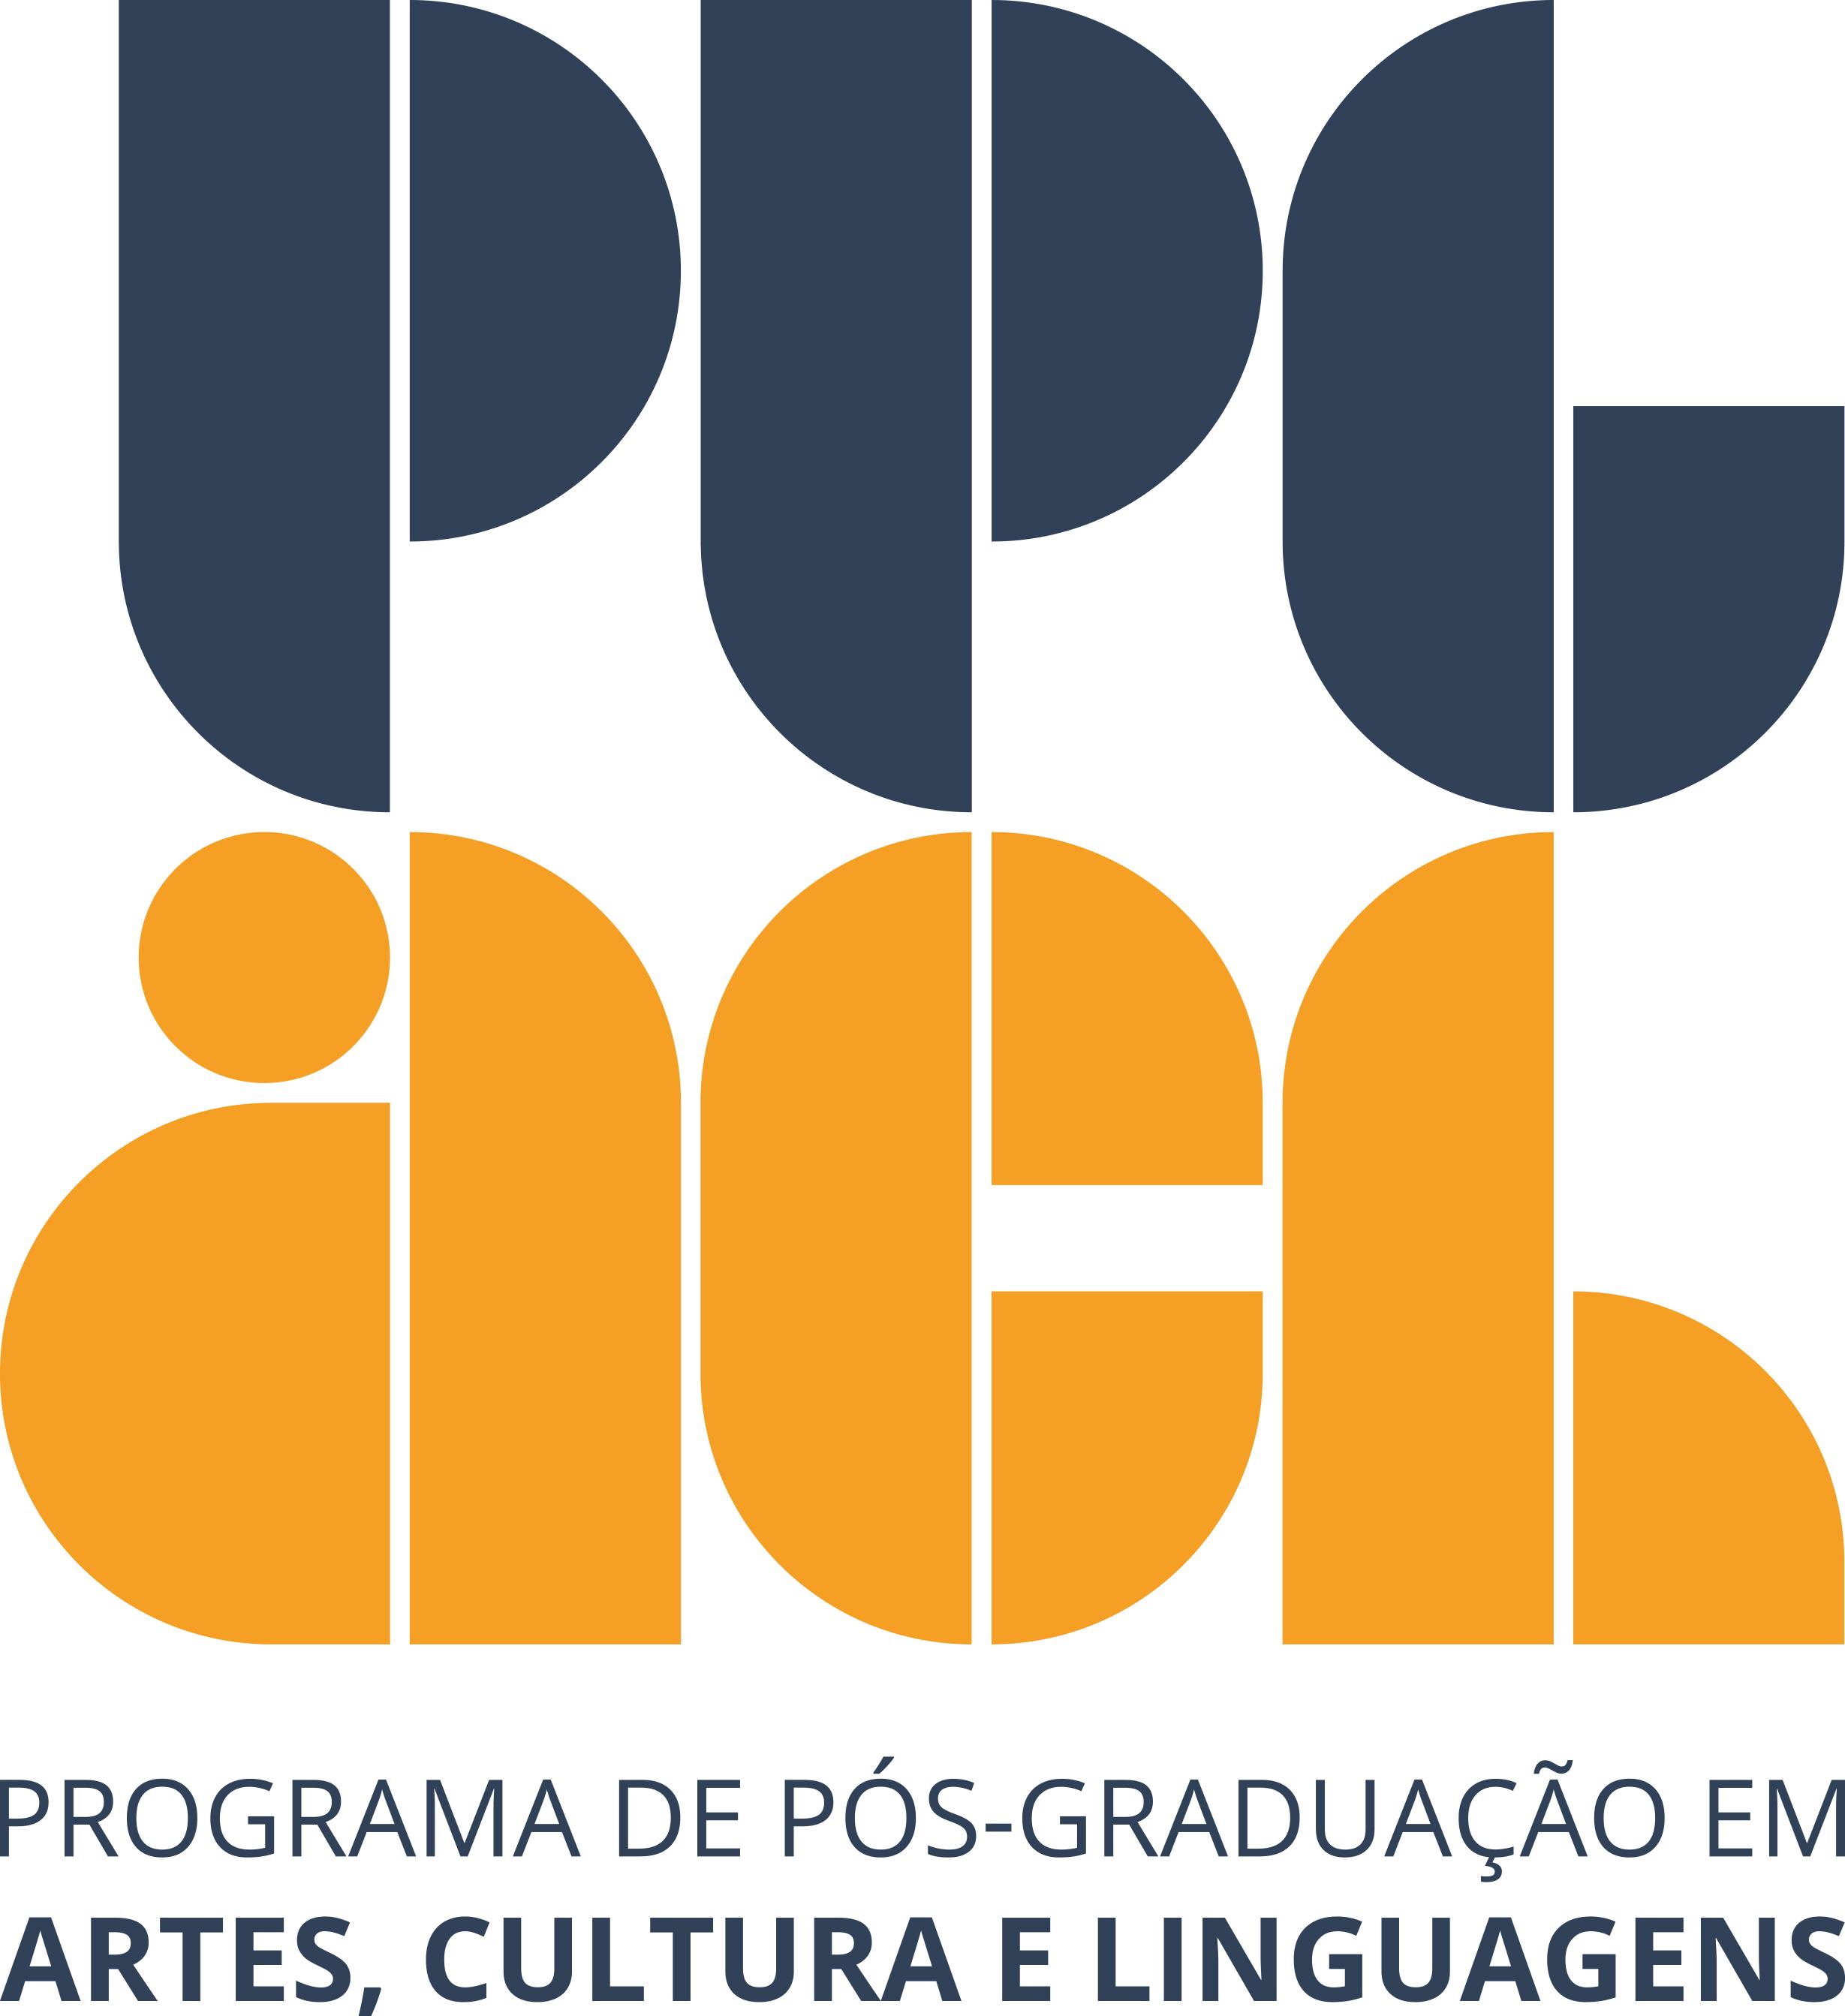 Abertura de edital para Recredenciamento de docentes permanentes e colaboradores para o PPGACL